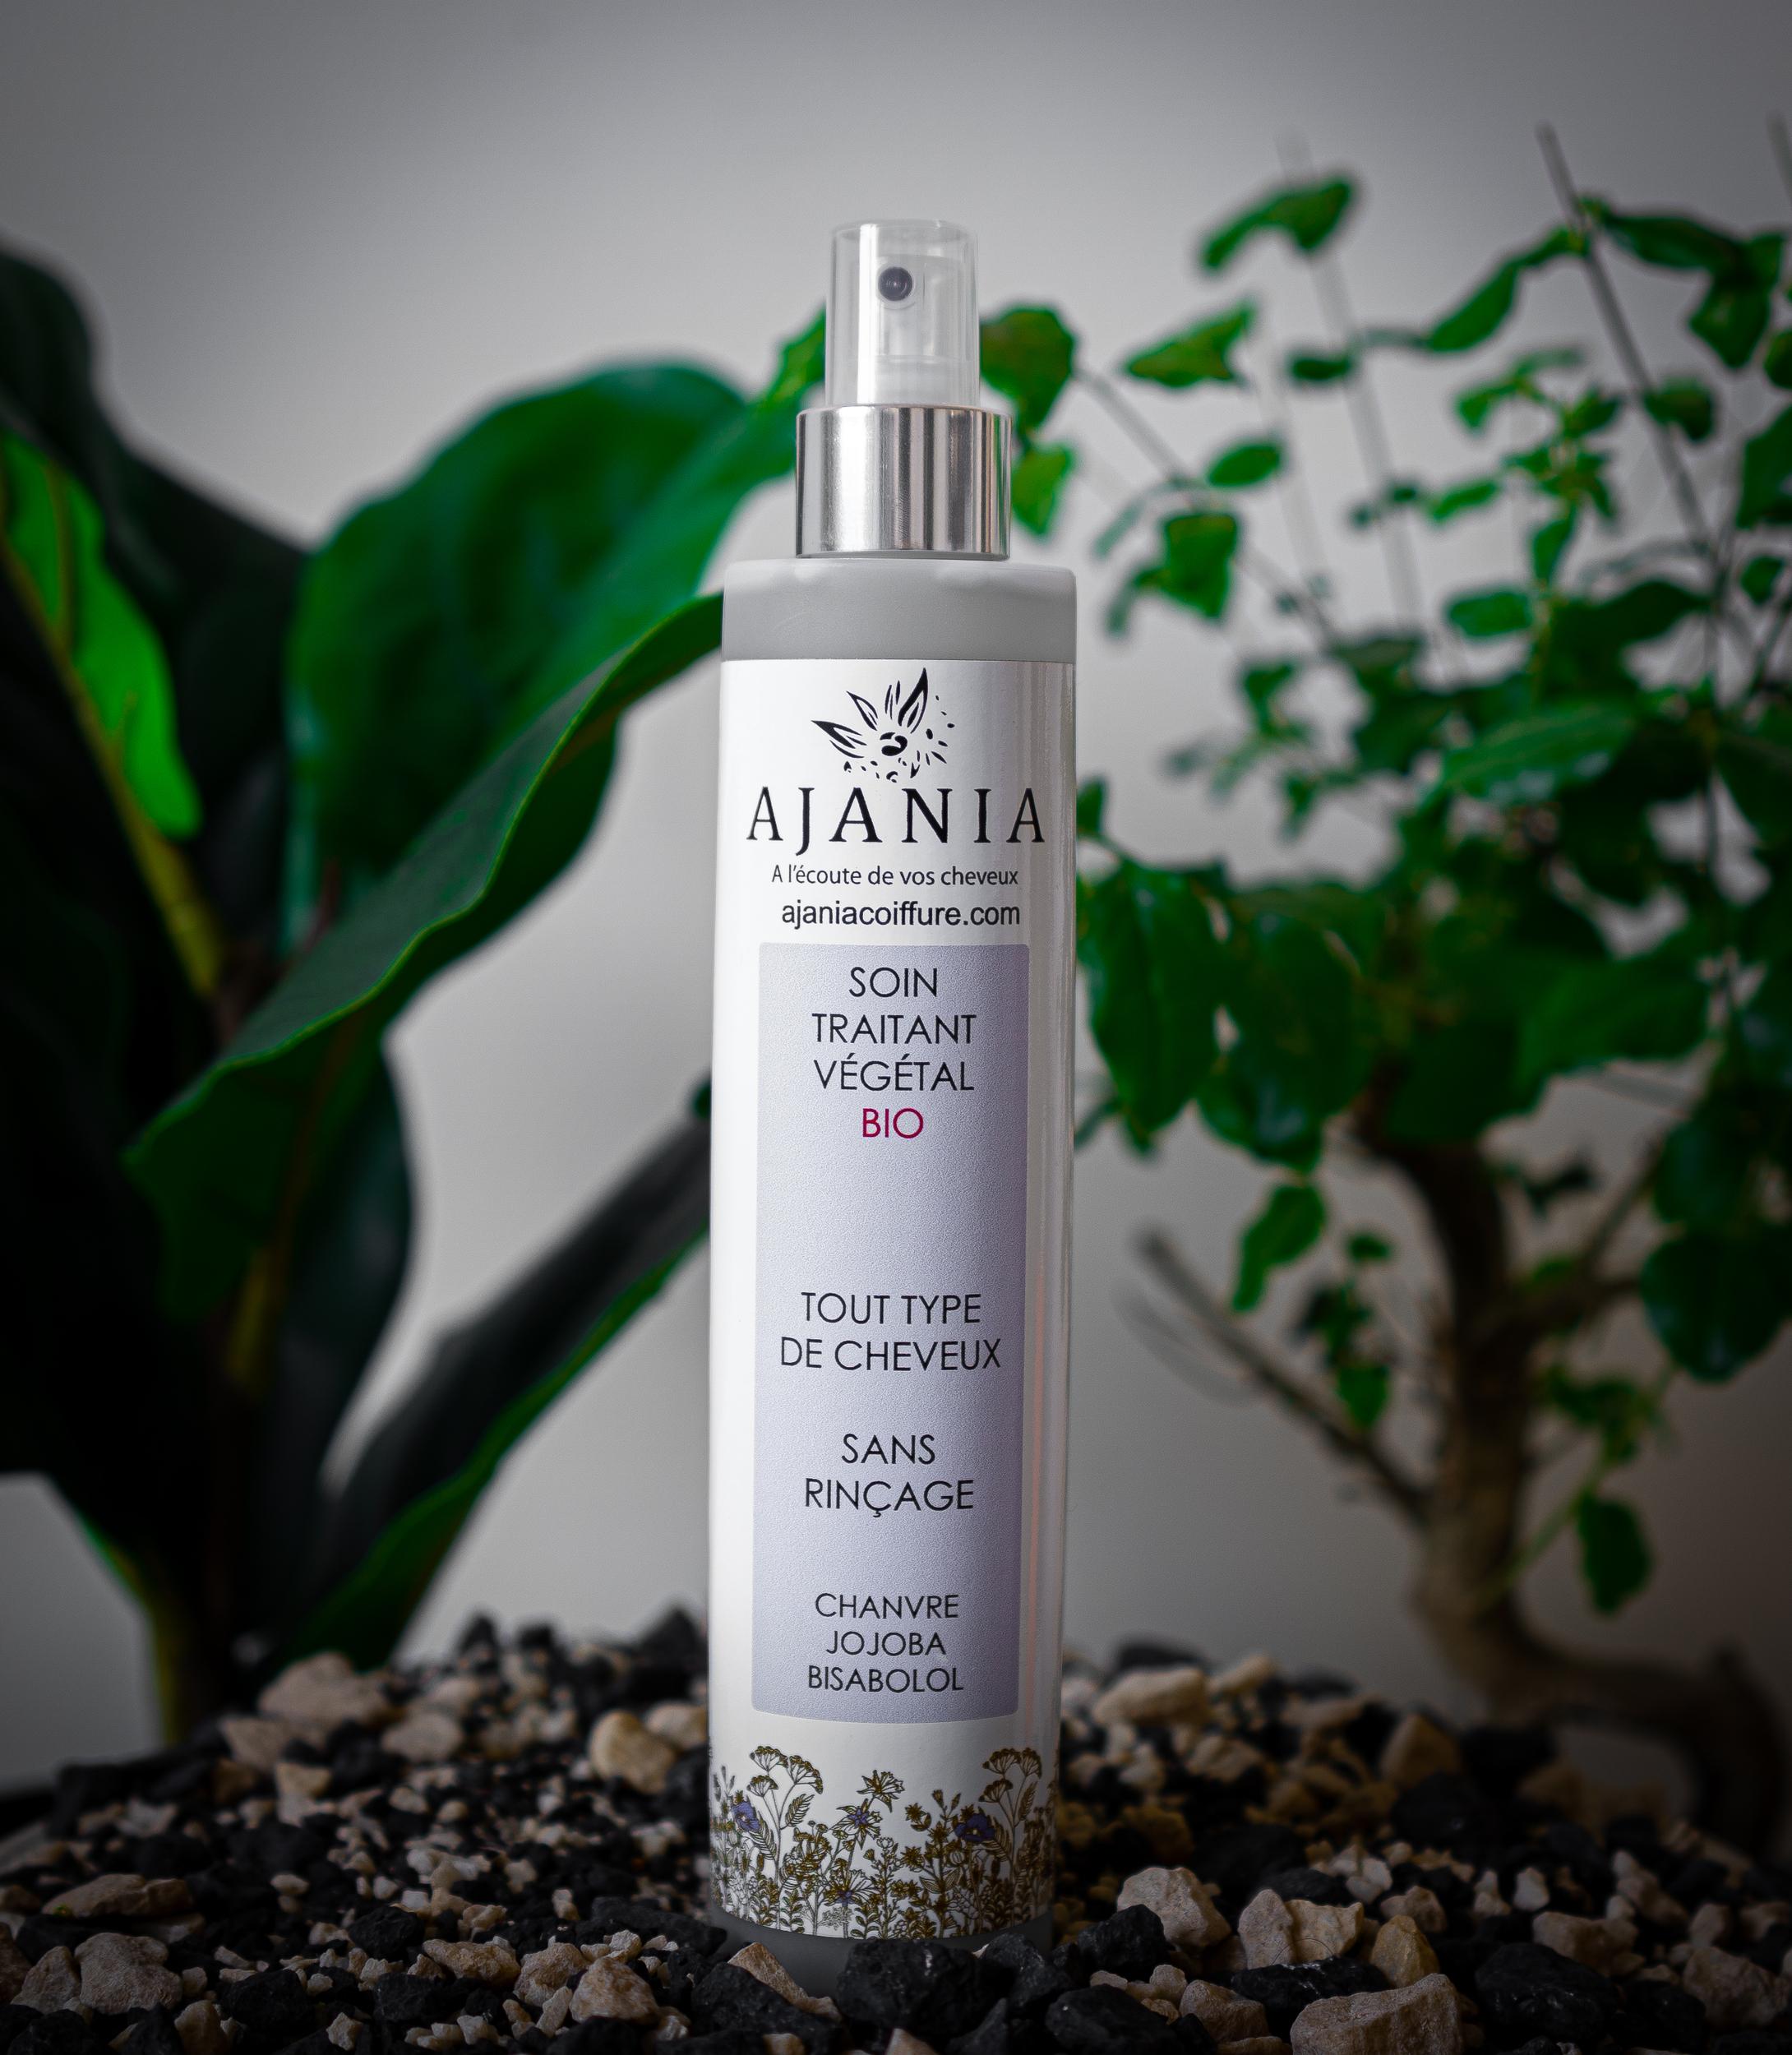 Ajania soin traitant végétal bio - 250 ml - Hydratant instantané sans rinçage huile de jojoba